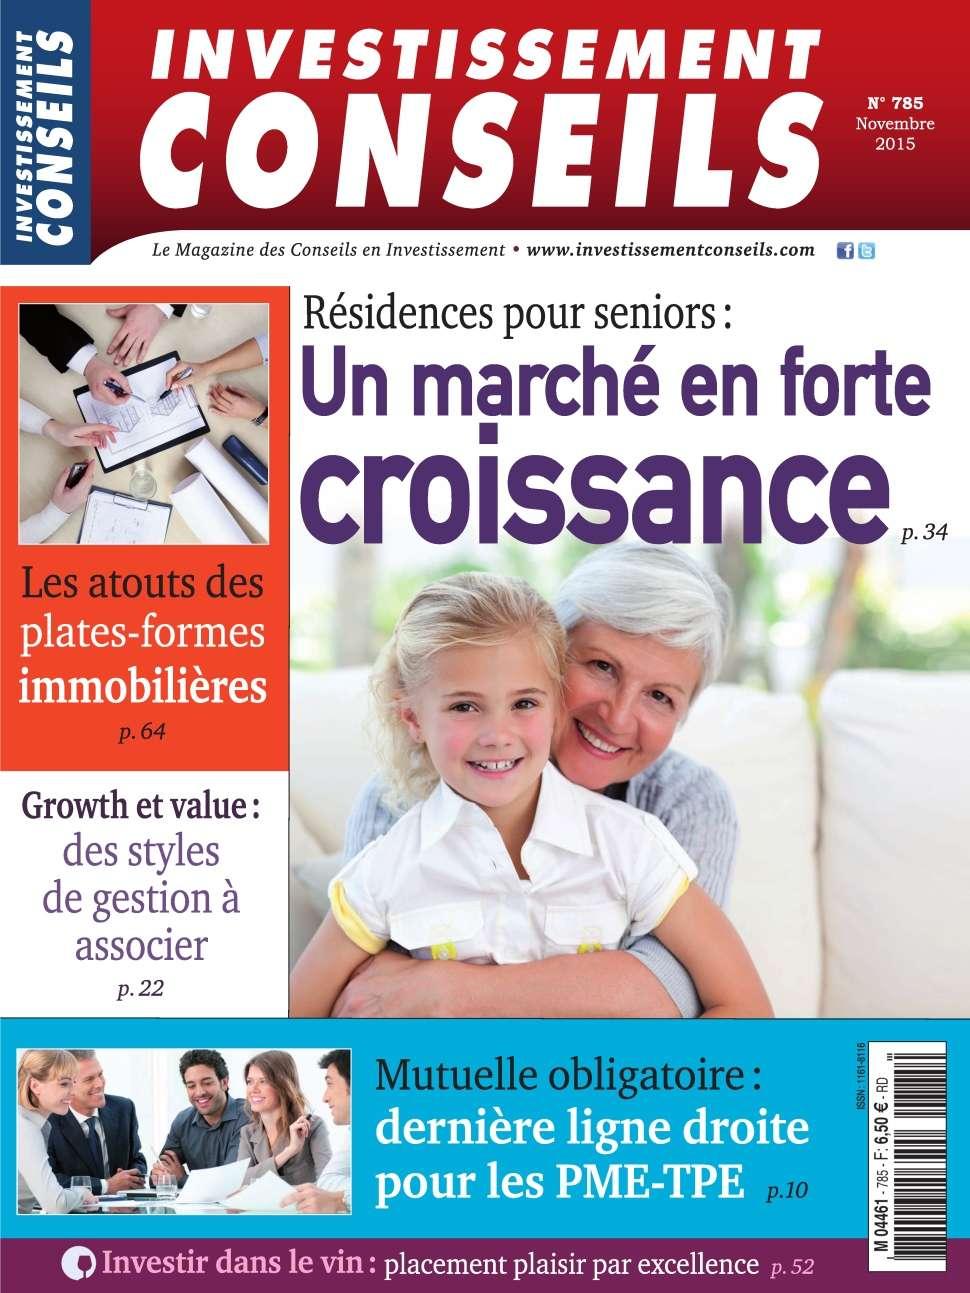 Investissement Conseils 785 - Novembre 2015